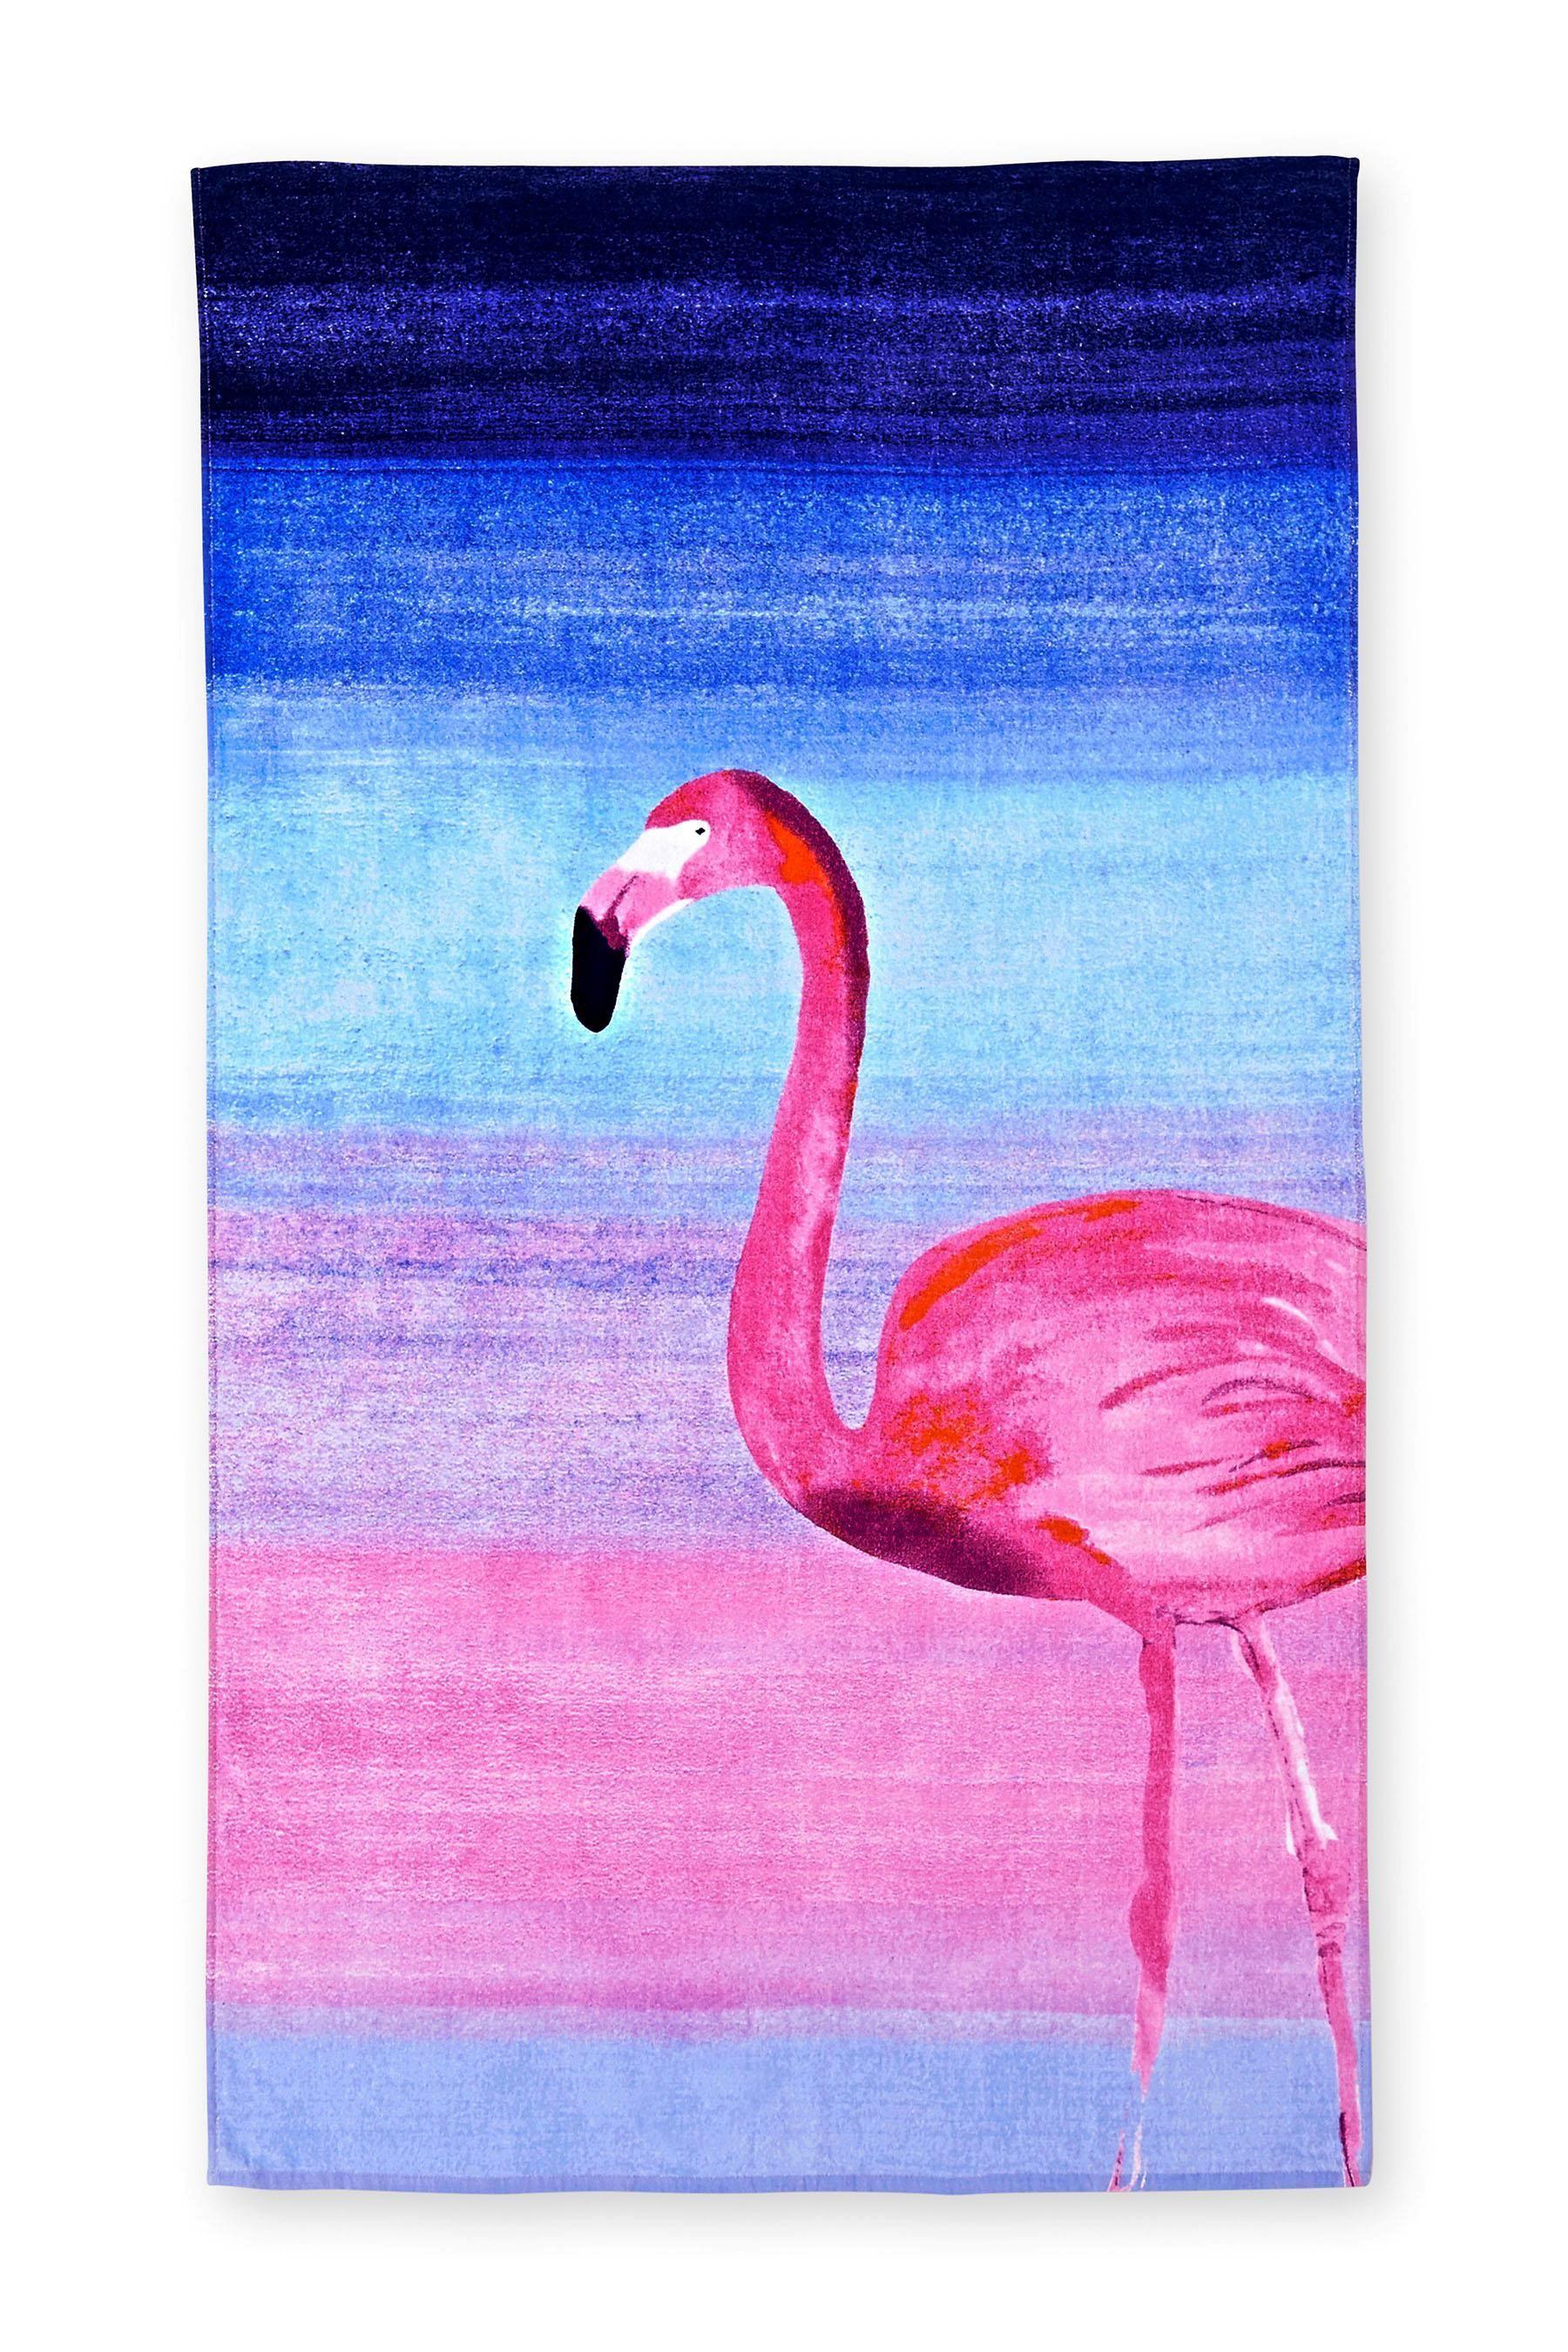 acheter serviette de plage imprim flamand rose en ligne sur next france pink flamingo. Black Bedroom Furniture Sets. Home Design Ideas